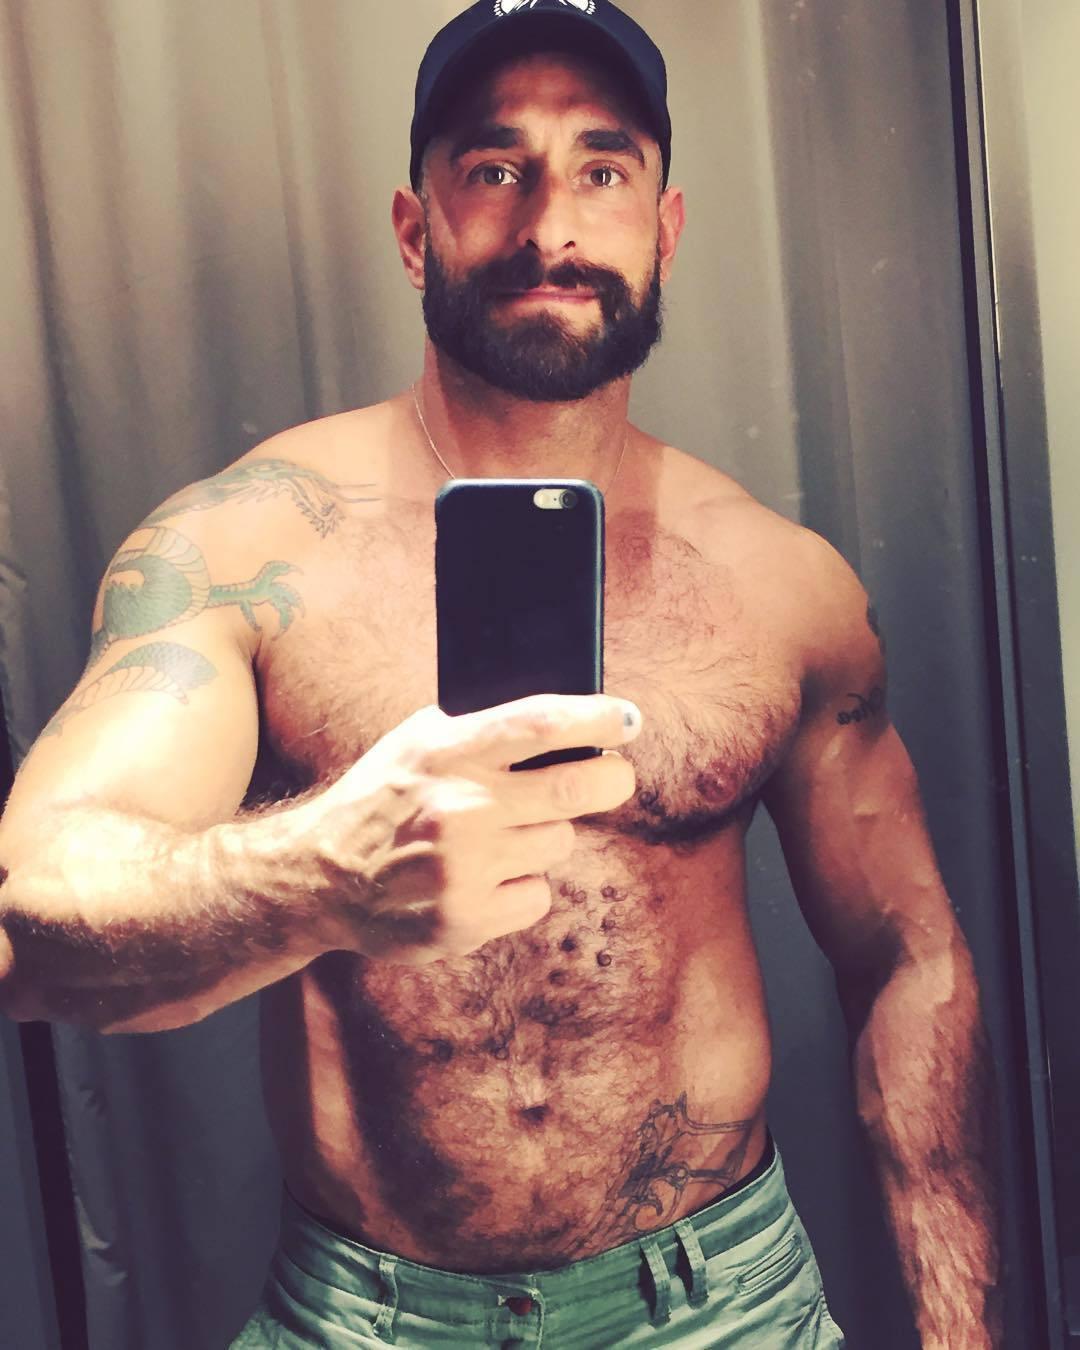 2018-06-04 05:21:36 - had to sneak a fitting room selfie by dbear97 beardburnme http://www.neofic.com